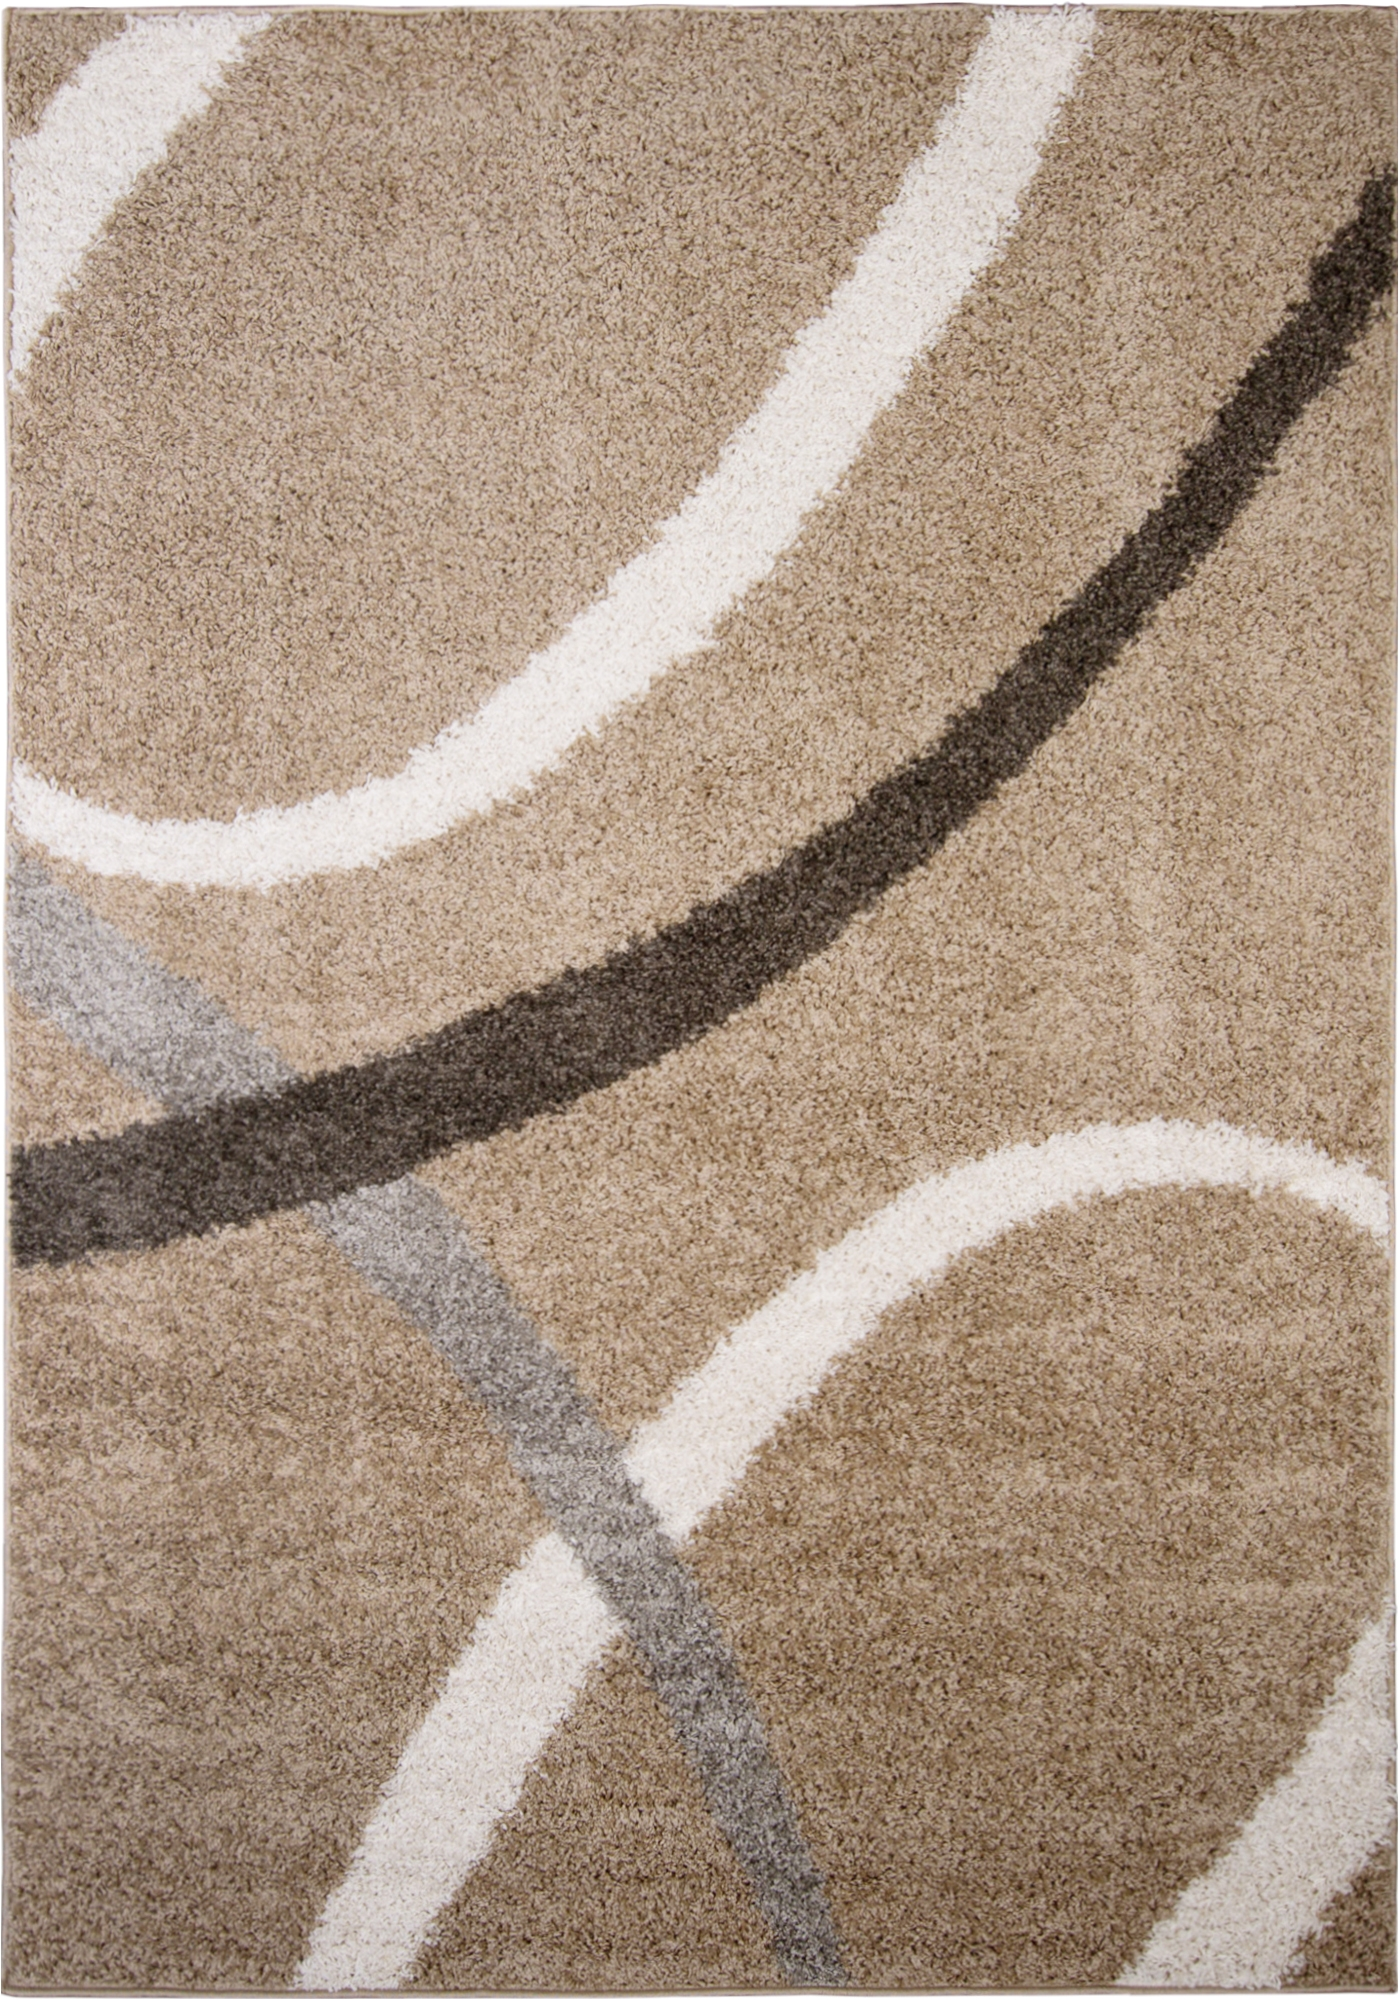 nicole miller designer area rug beige white geometric swirls carpet